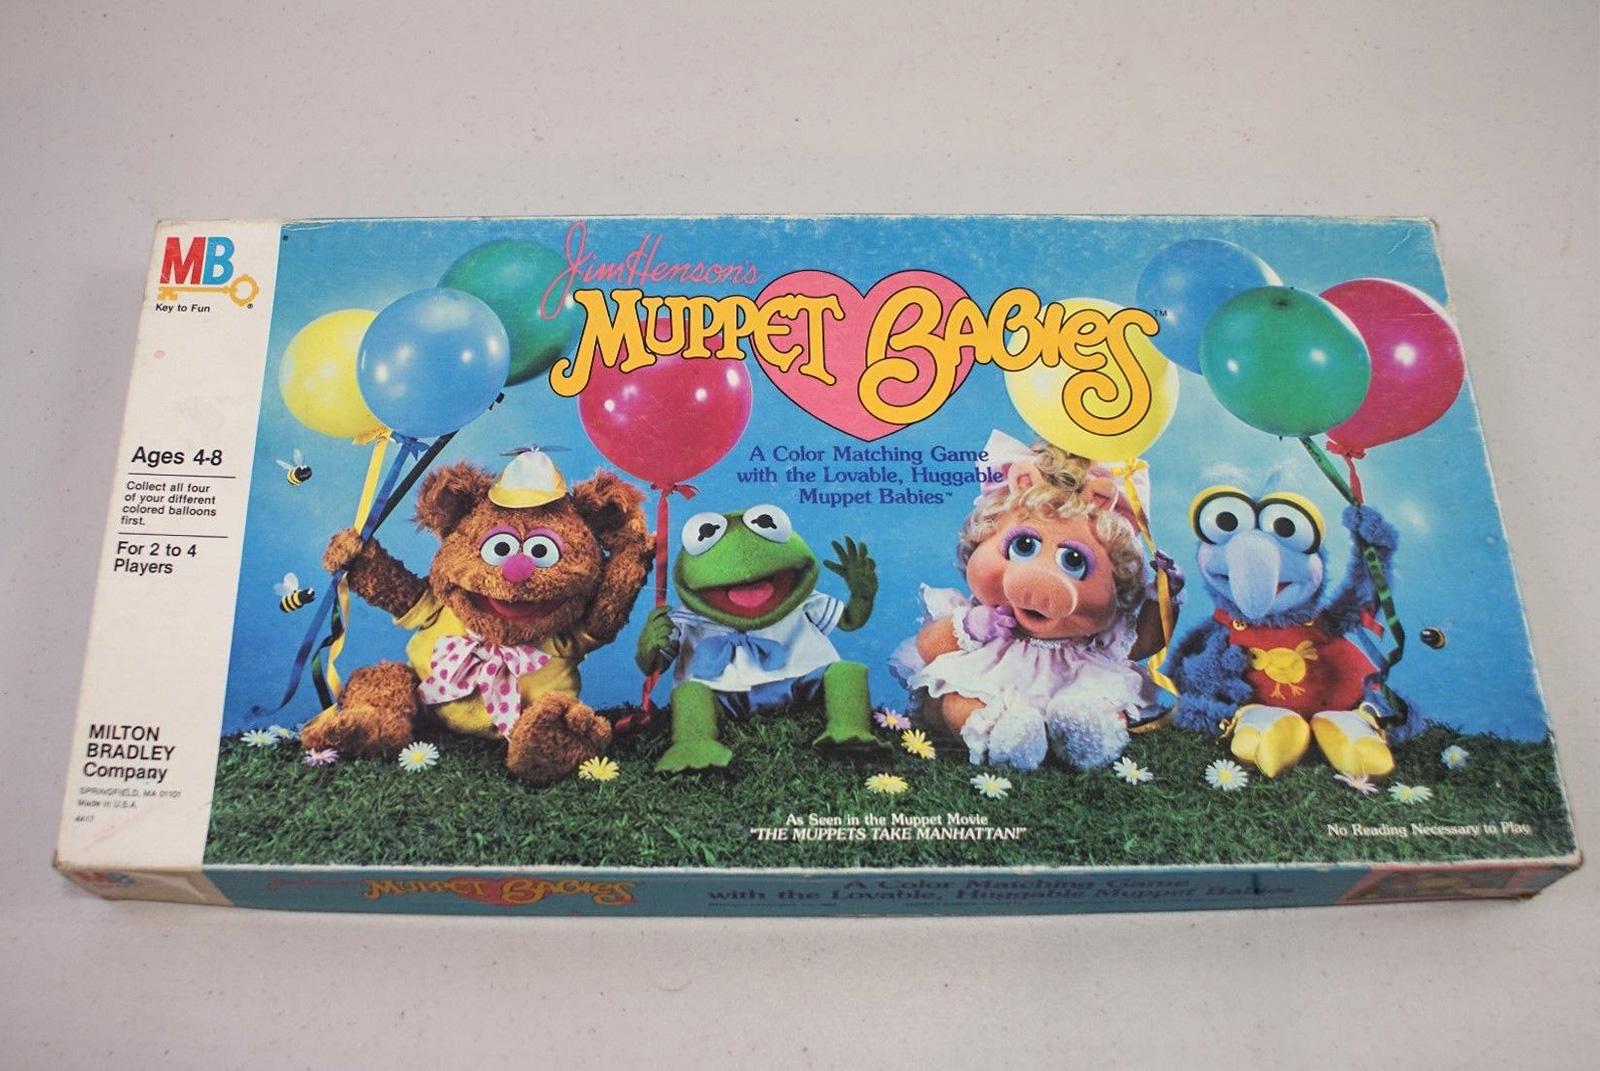 Muppet Babies (1984 board game)